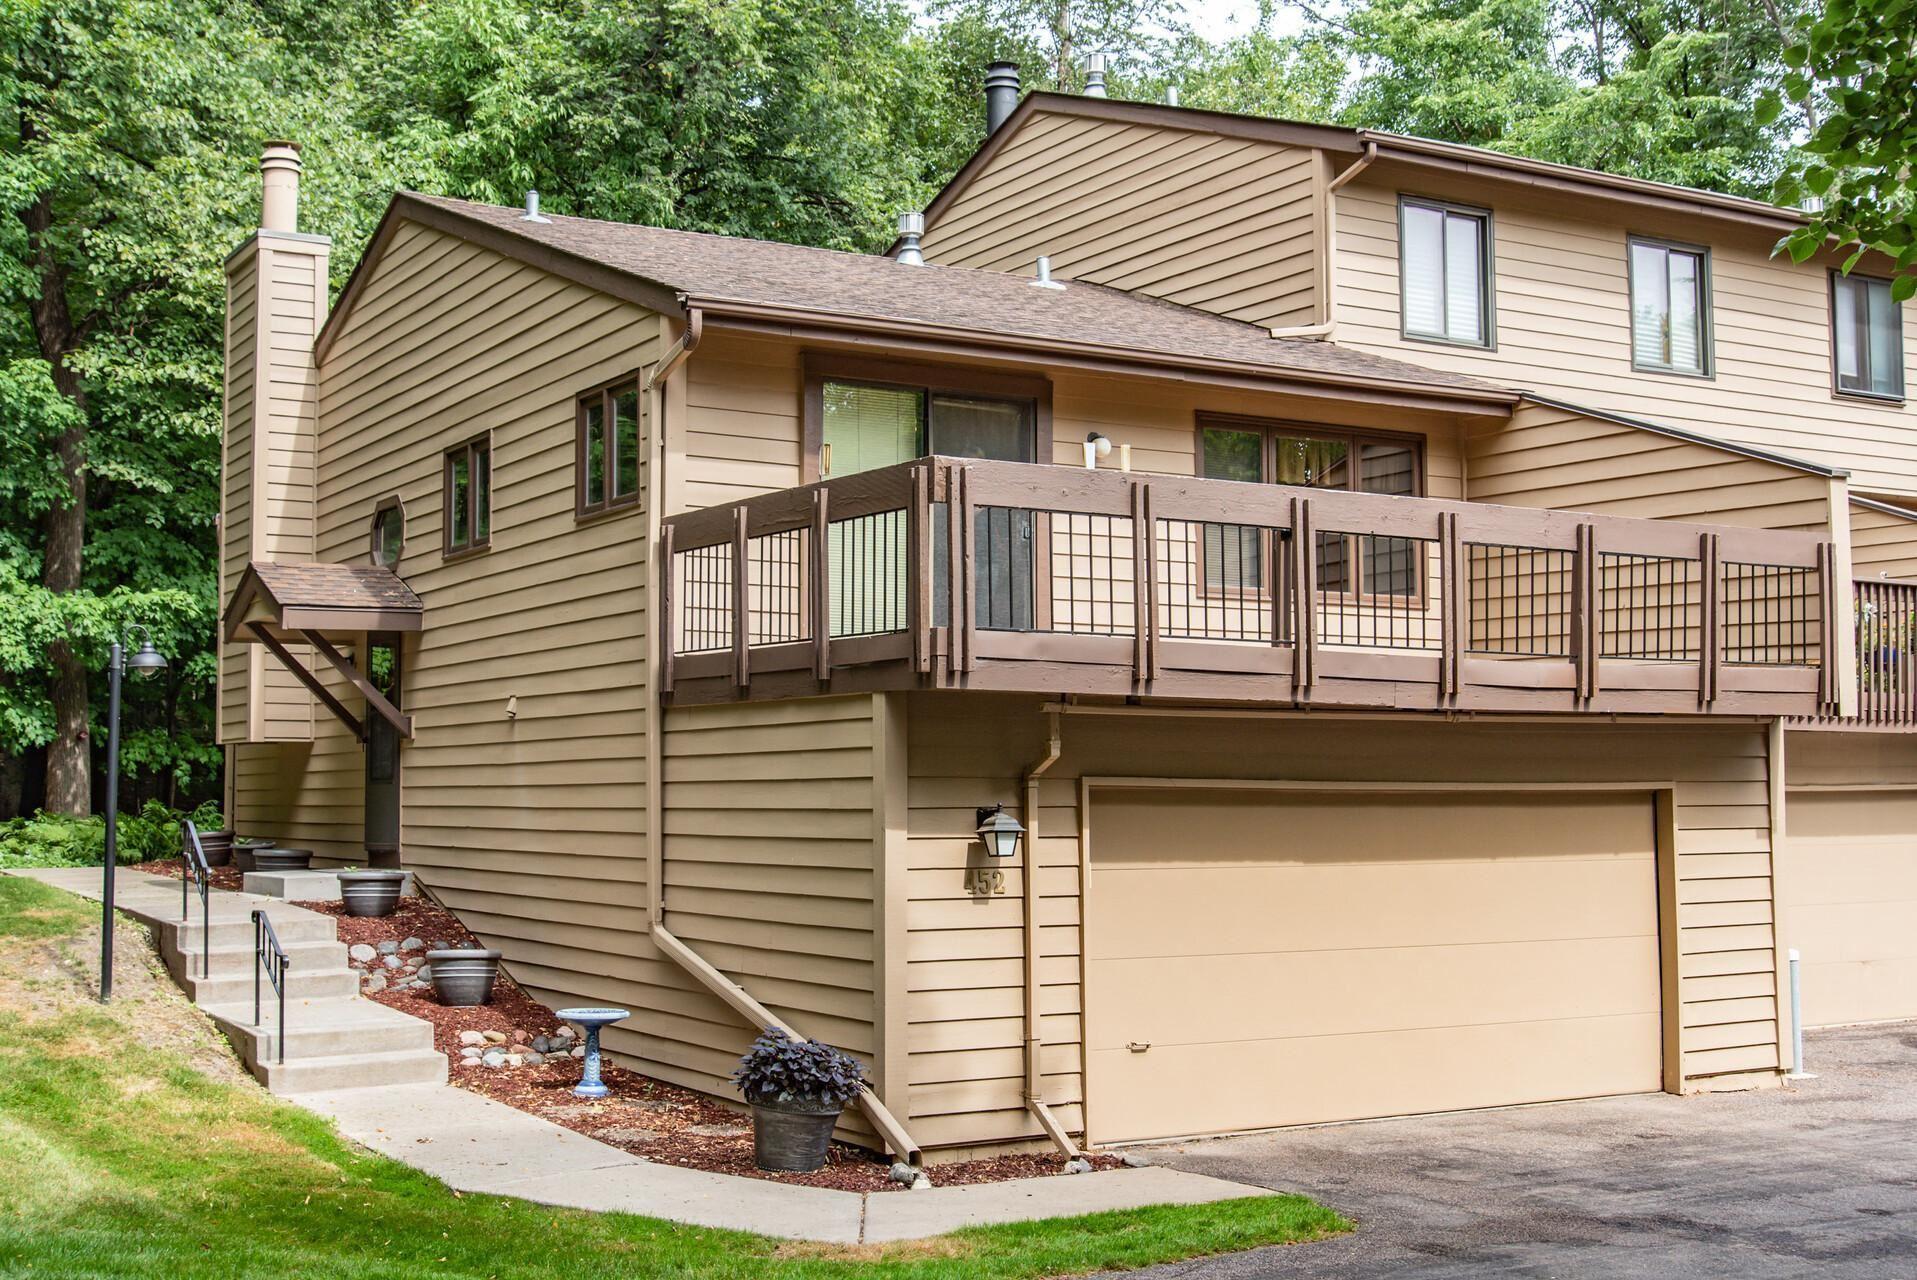 452 W Eagle Lake Drive, Maple Grove, MN 55369 - MLS#: 5622787